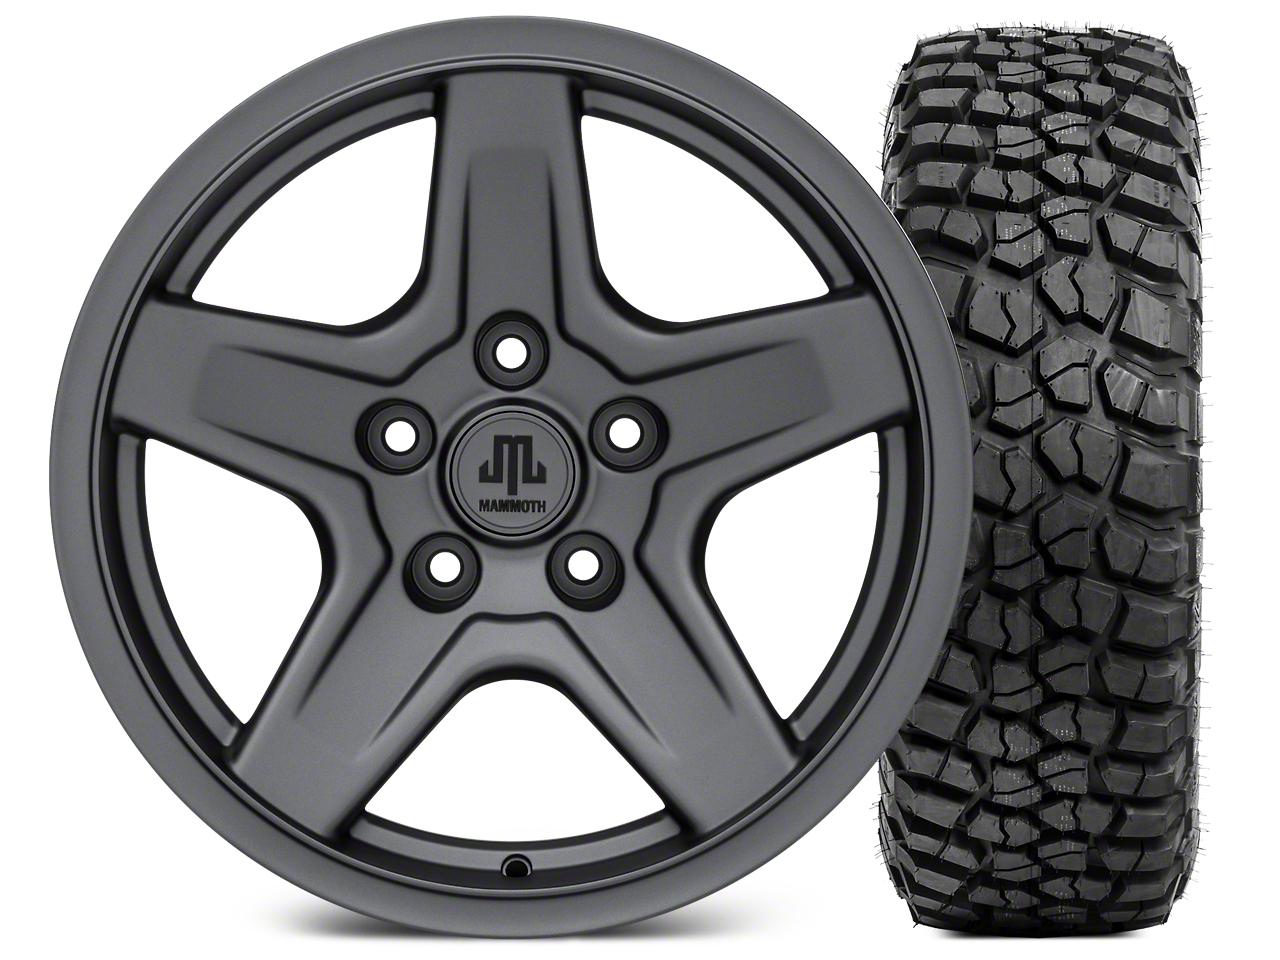 Mammoth Boulder Charcoal Wheel - 17x9 and BFG KM2 Tire 305/70- 17 (07-18 Jeep Wrangler JK; 2018 Jeep Wrangler JL)